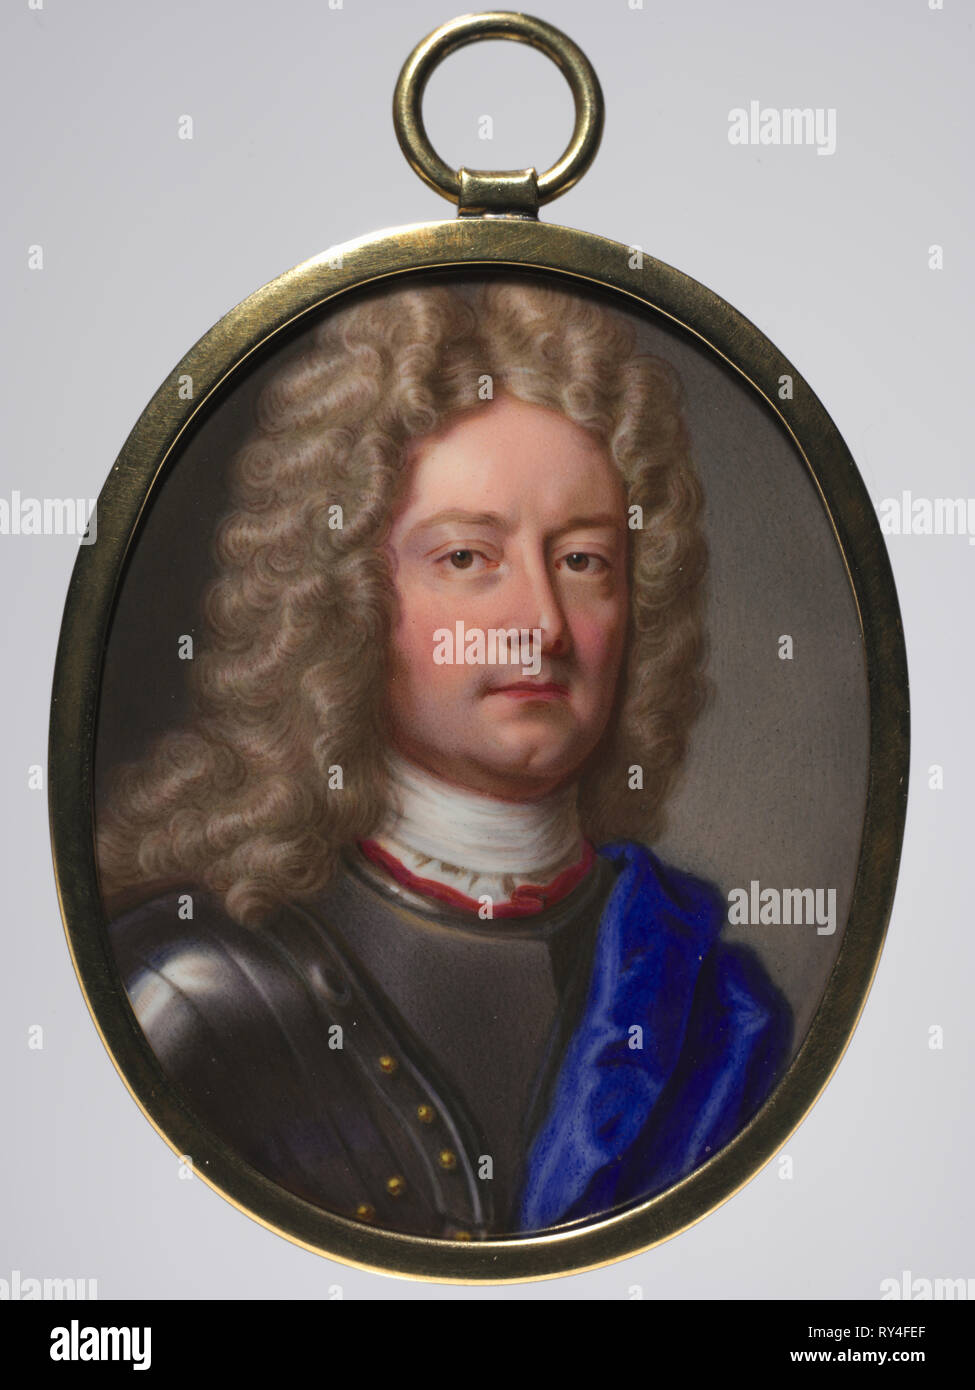 Portrait of John Churchill, 1st Duke of Marlborough, 1715. Christian Friedrich Zincke (German, 1683/85-1767). Enamel on copper in a gilt metal frame; framed: 6.4 x 5.1 cm (2 1/2 x 2 in.); sight: 5.9 x 4.8 cm (2 5/16 x 1 7/8 in - Stock Image